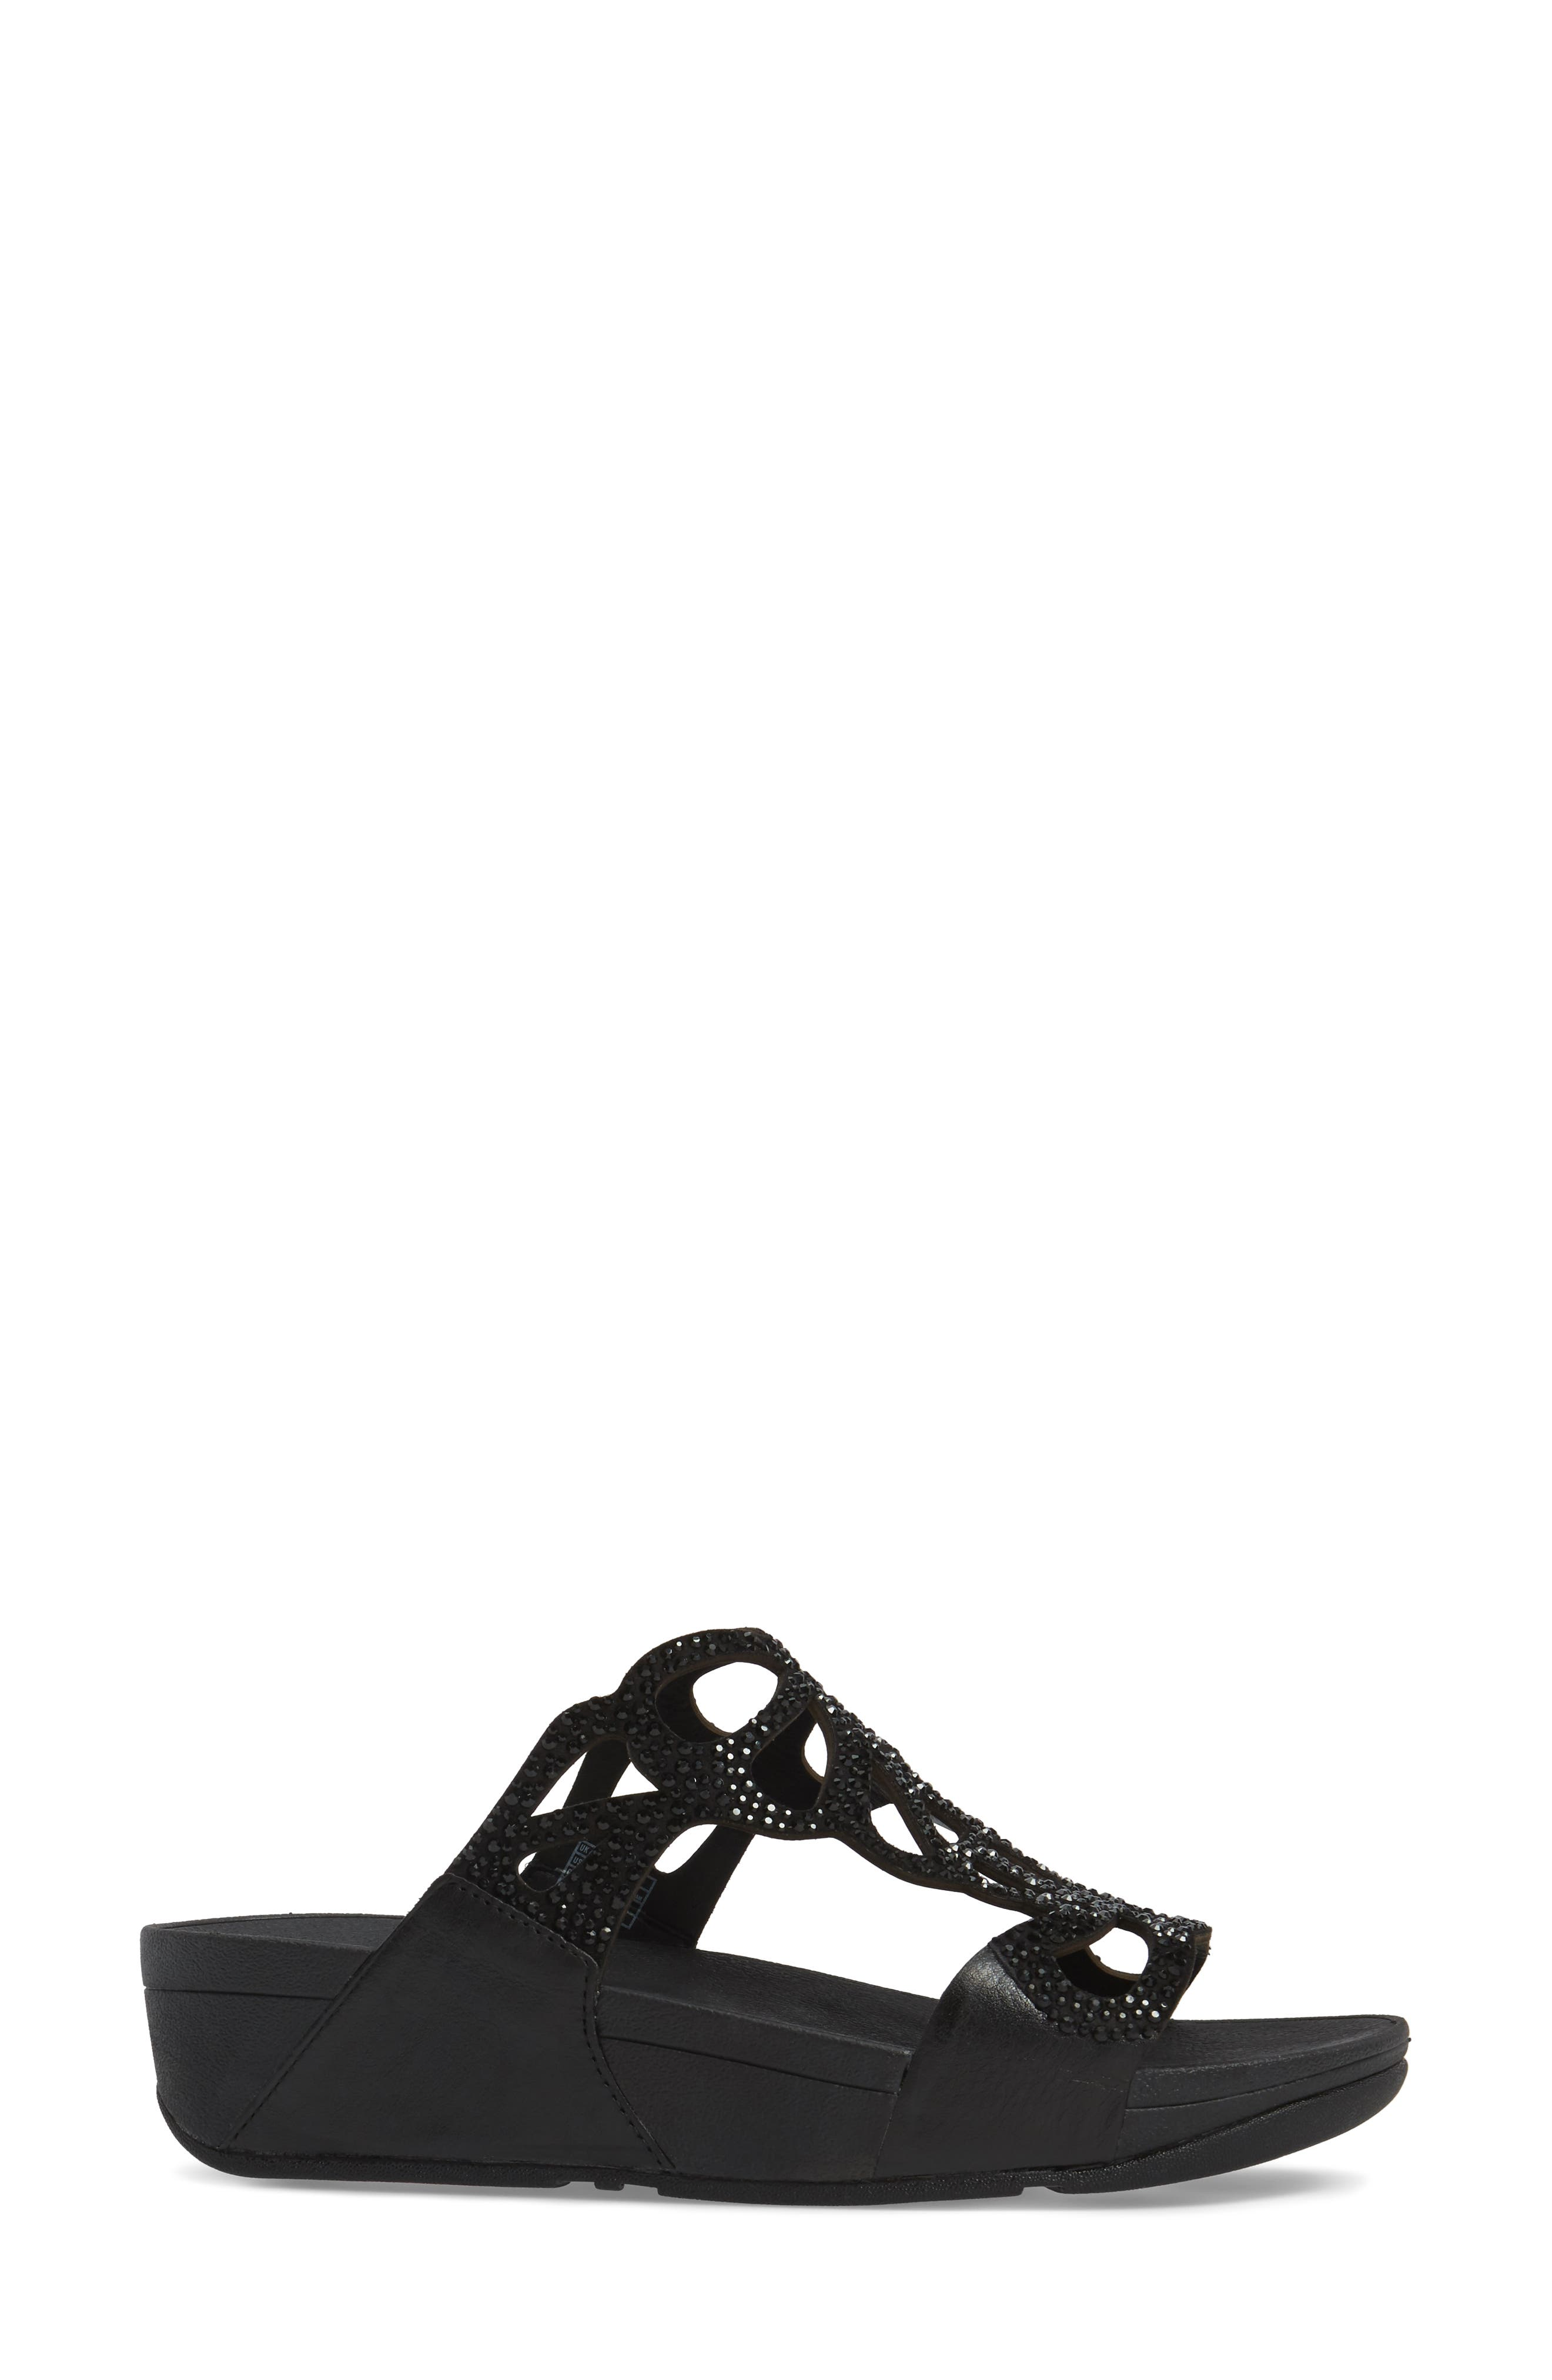 Bumble Wedge Slide Sandal,                             Alternate thumbnail 3, color,                             BLACK LEATHER